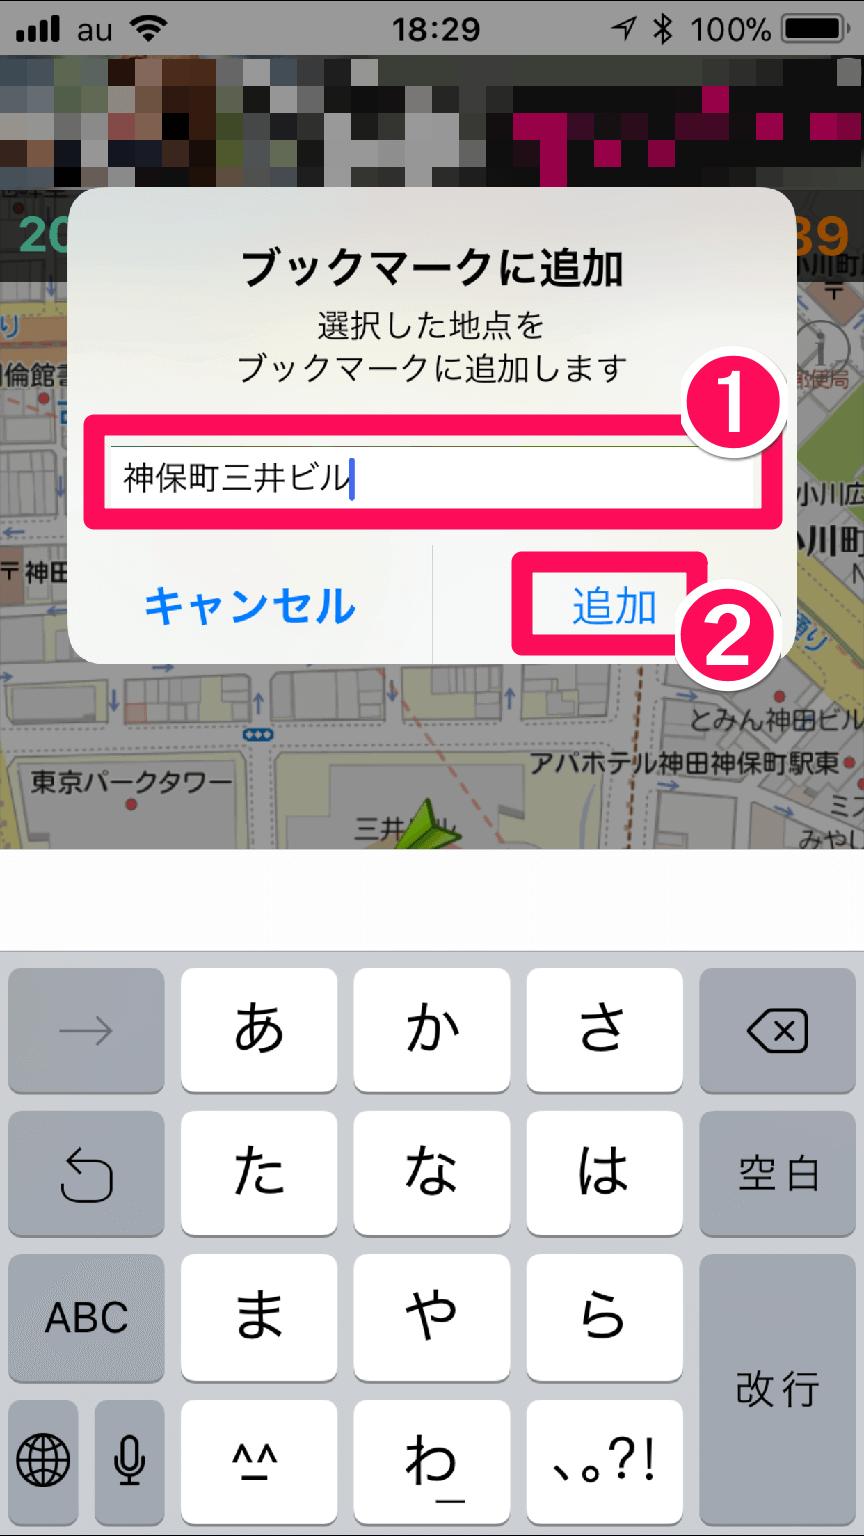 iPhone版[日の出日の入マピオン]アプリの[ブックマーク]画面